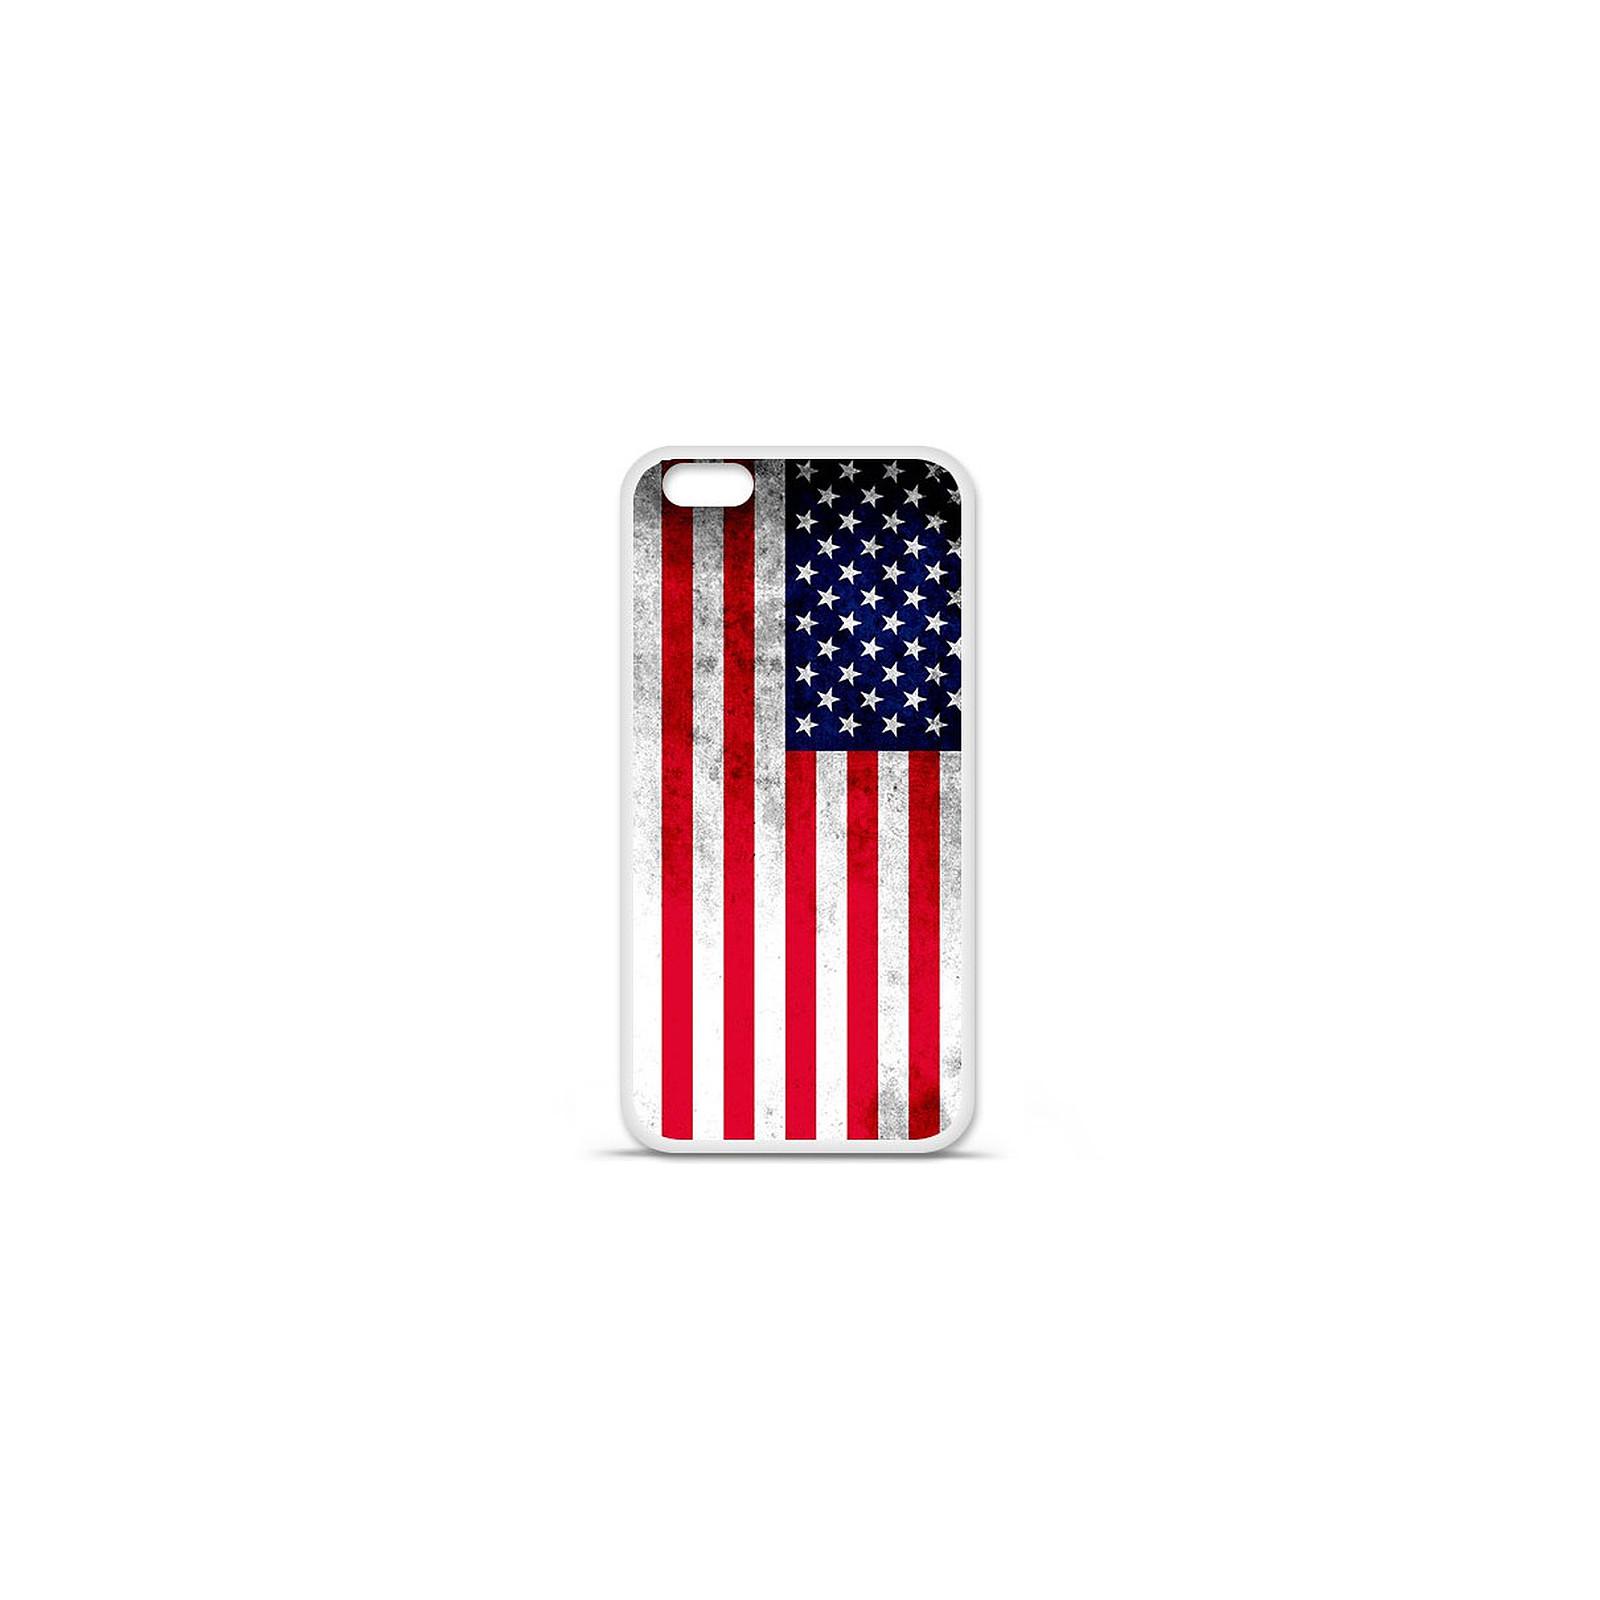 1001 Coques Coque silicone gel Apple IPhone 7 Plus motif Drapeau USA